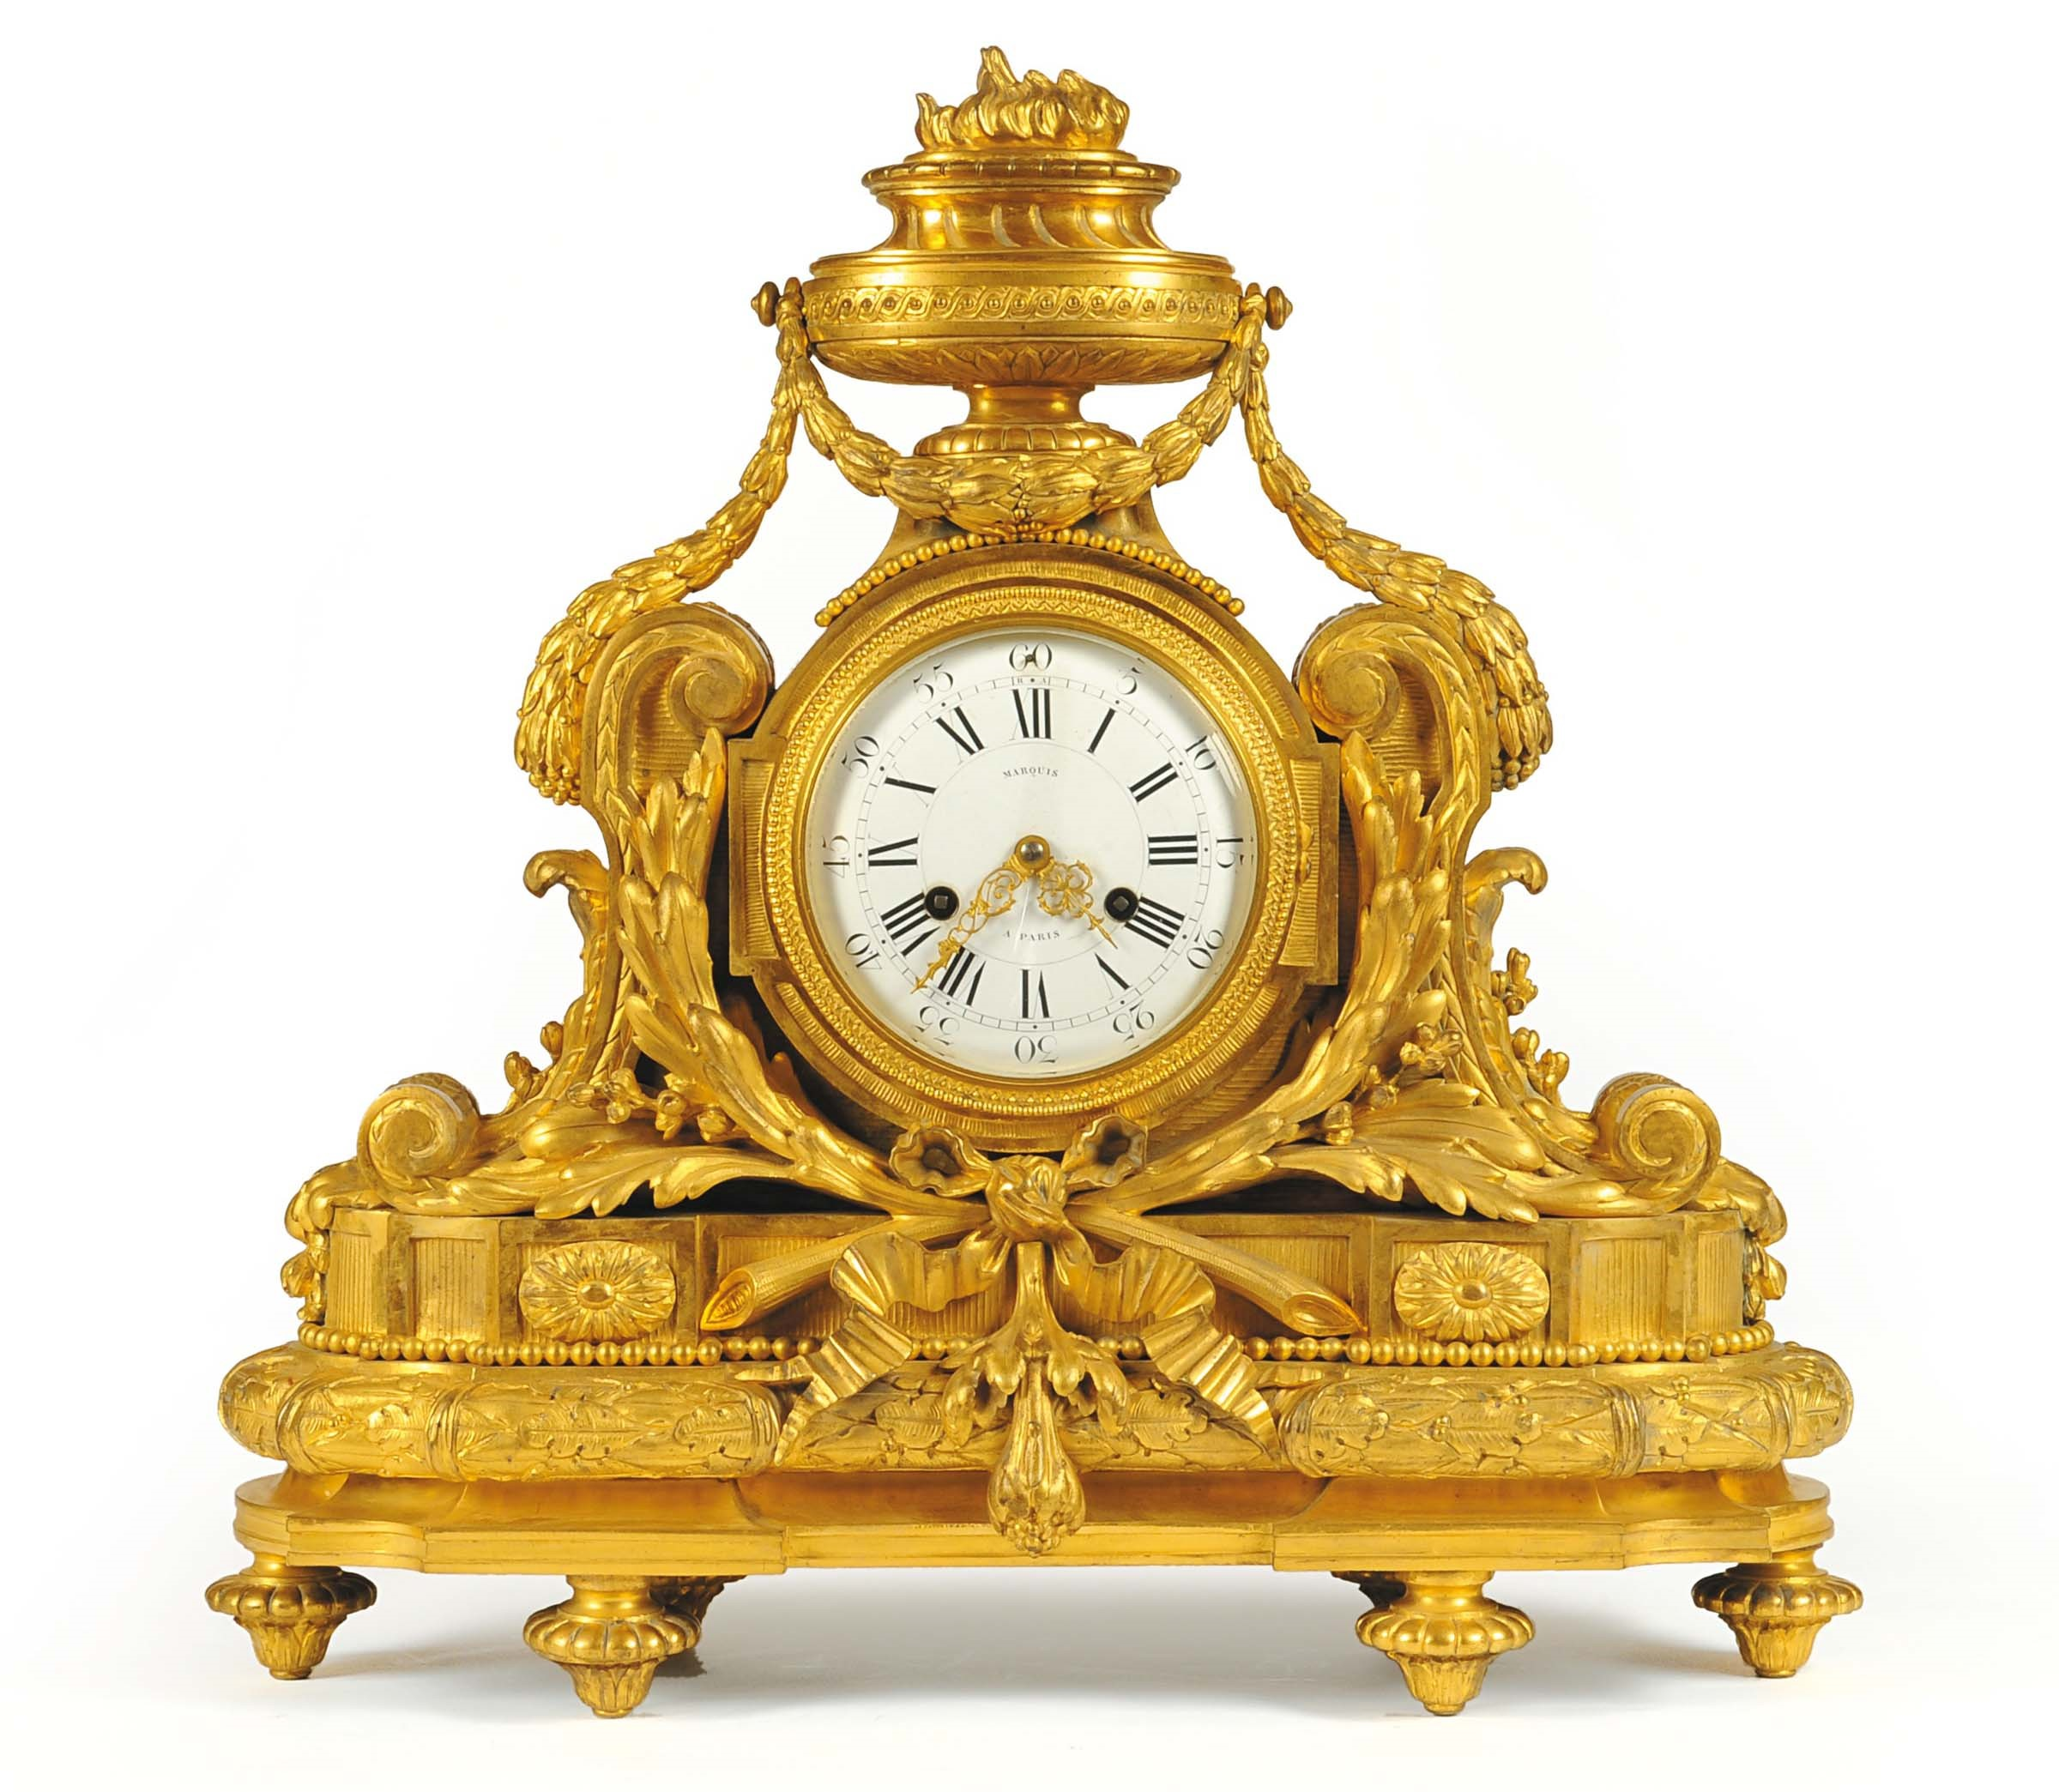 Orologi antichi da tavolo antiquares - Orologio da tavolo antico ...